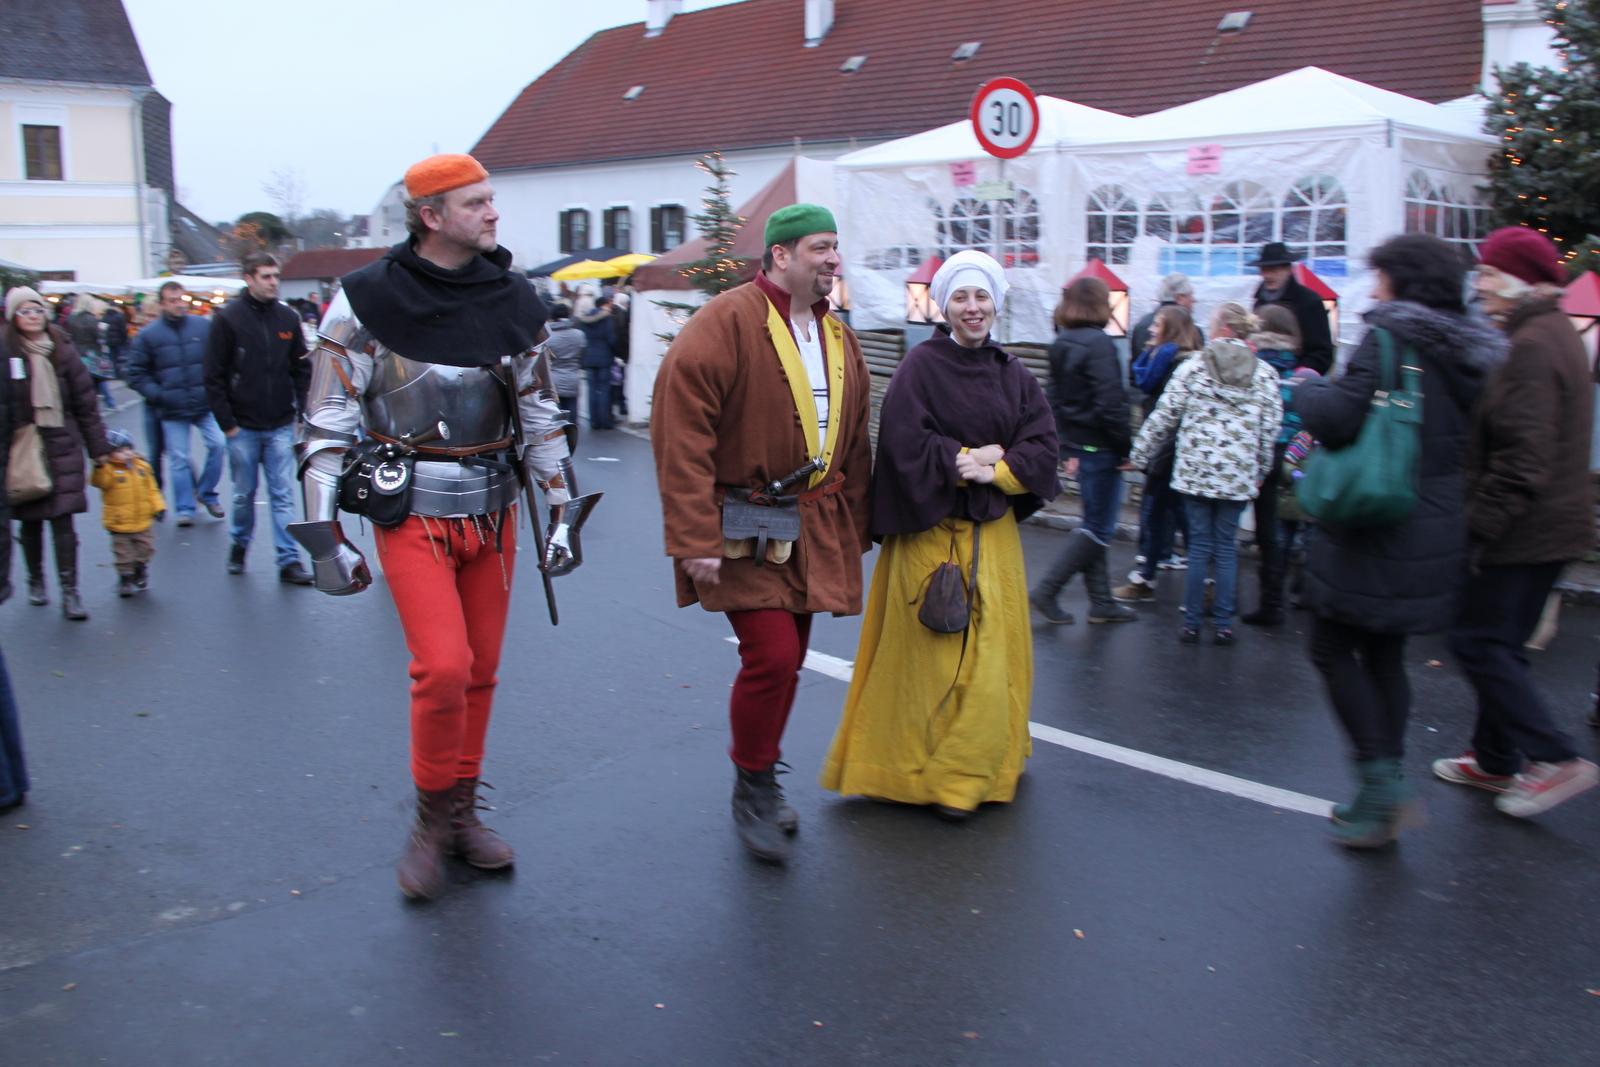 Stadtschlaining, srednjeveški advent